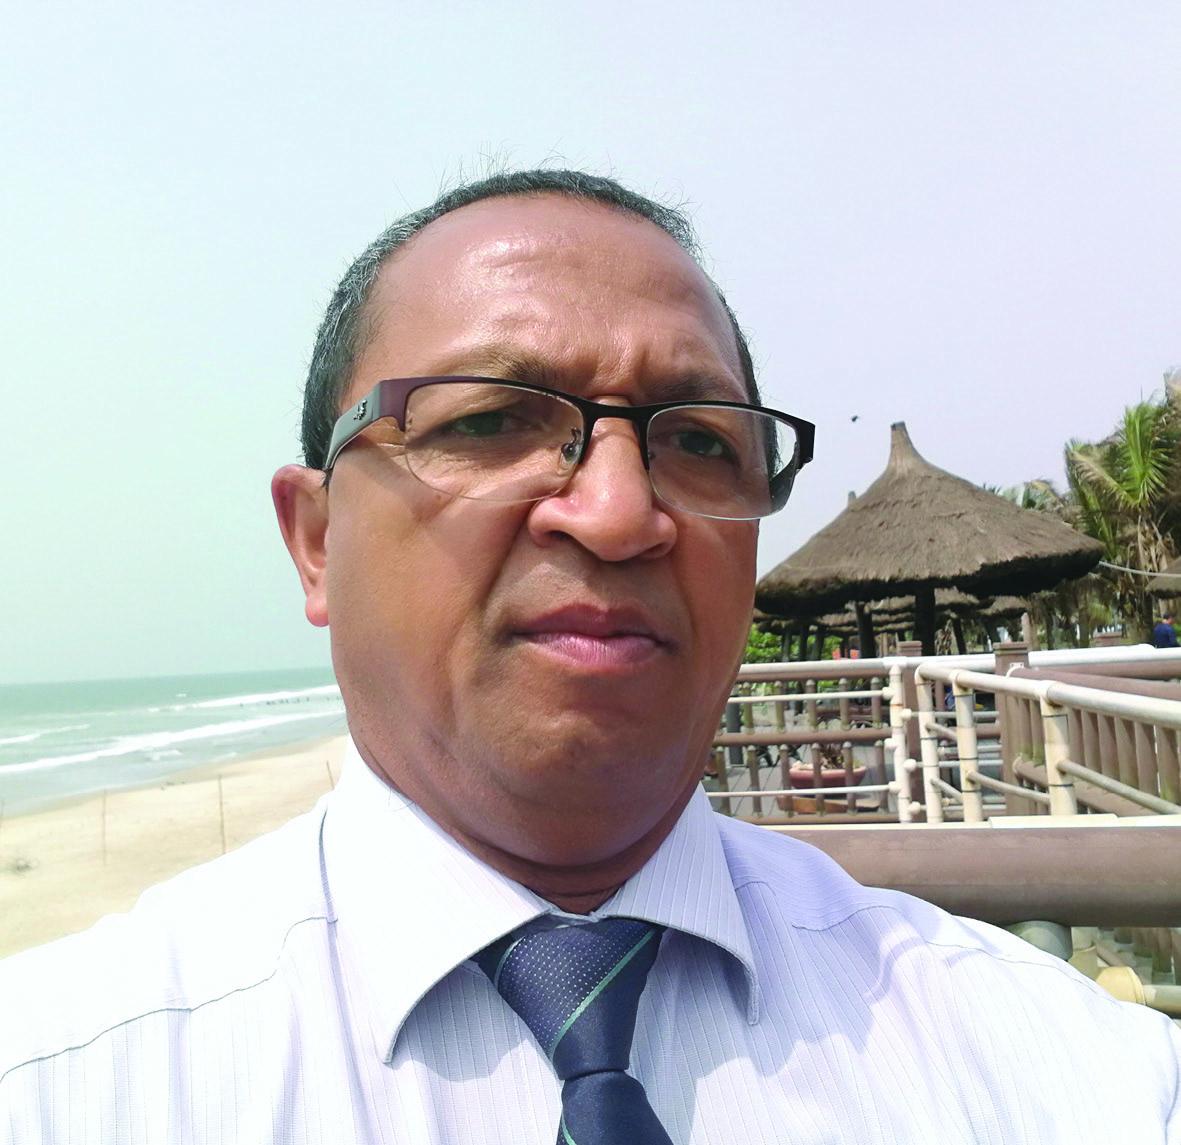 Hery Harimanitra Andriamanjato